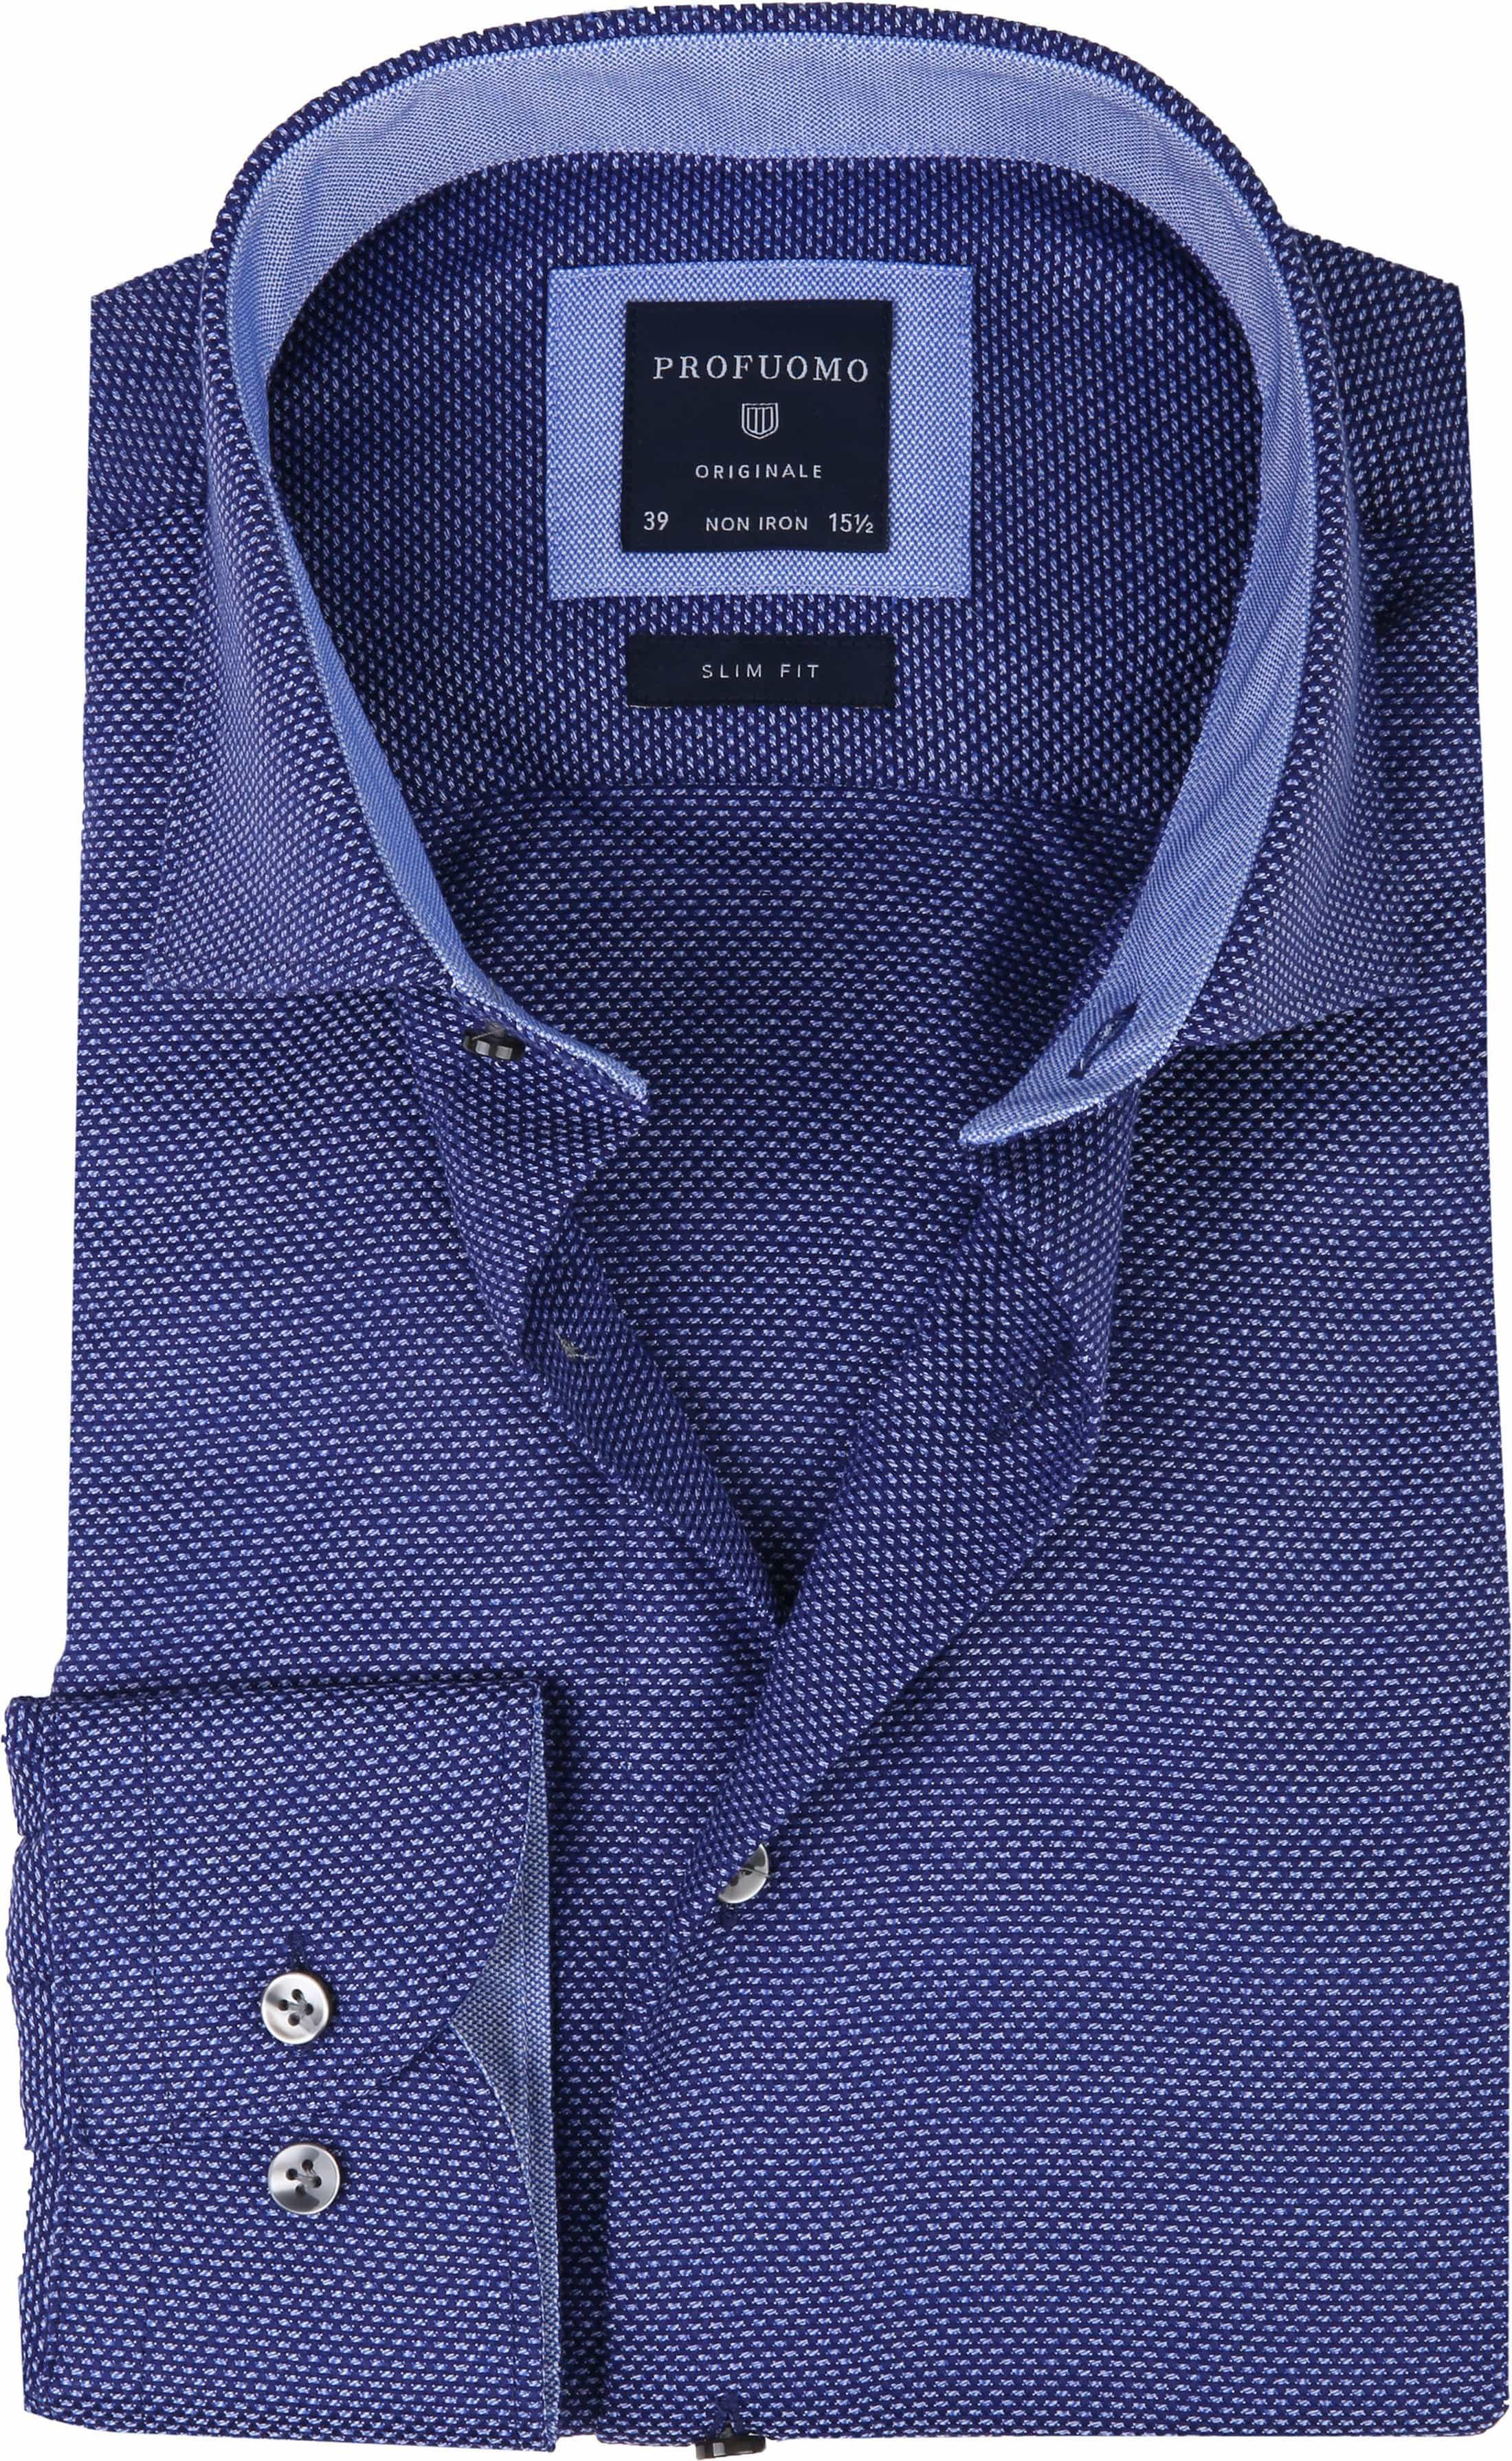 Profuomo Overhemd Oxford Navy Dessin foto 0